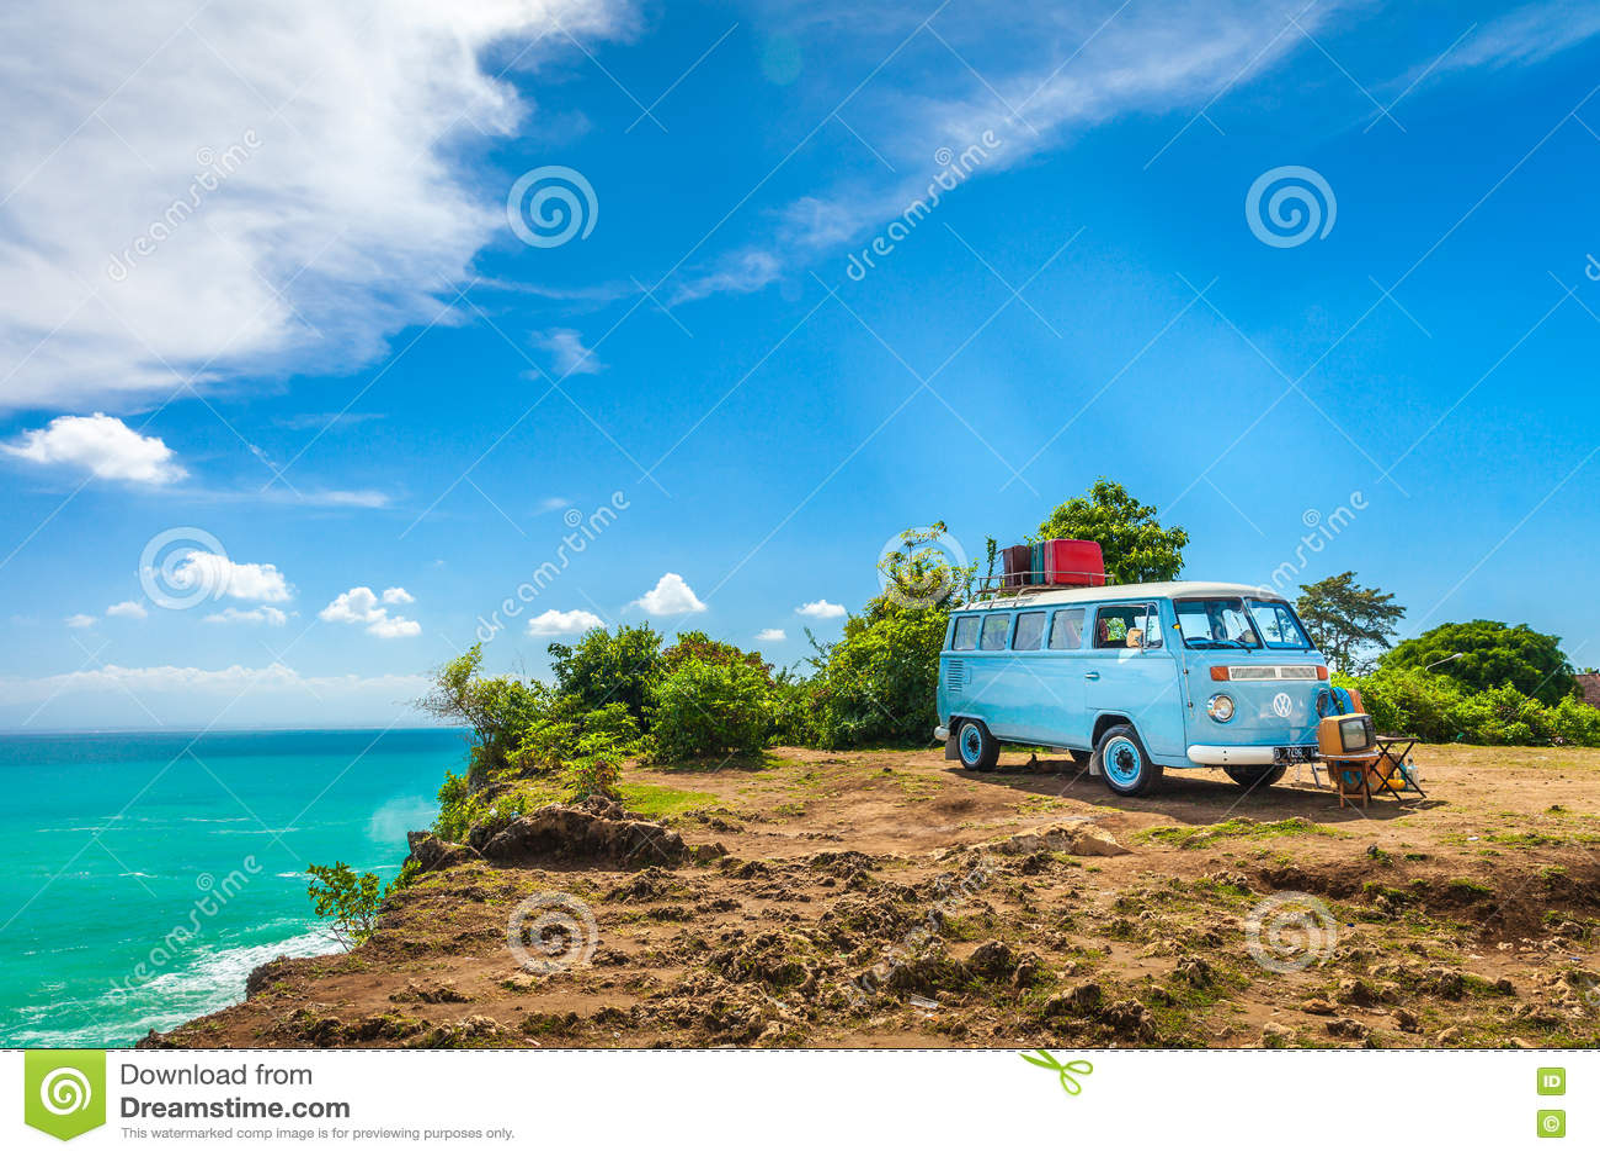 Beautiful Vintage Retro Car Volkswagen Van Hippie Minibus ...